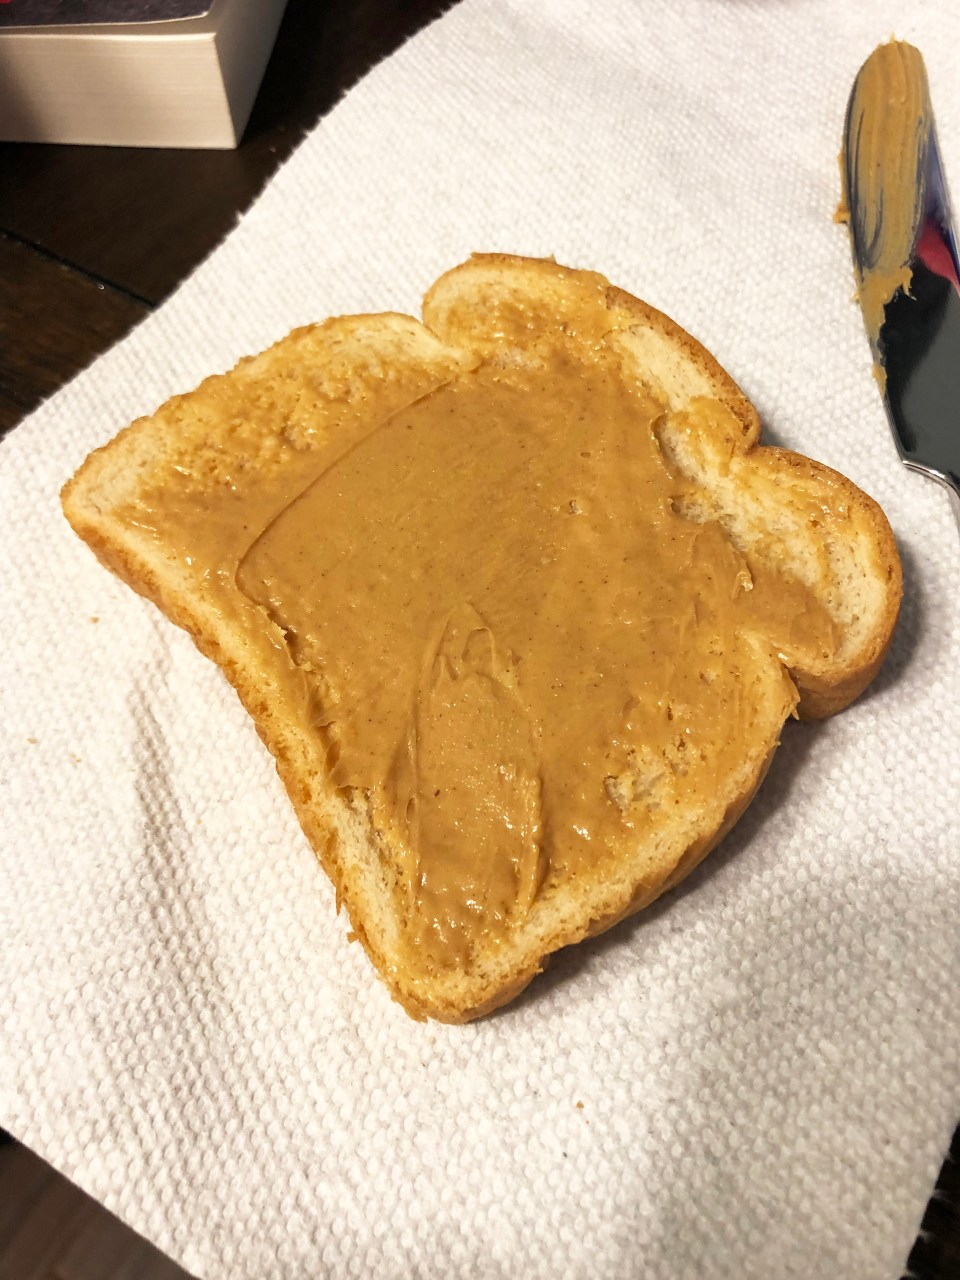 Peanut Butter + Bread